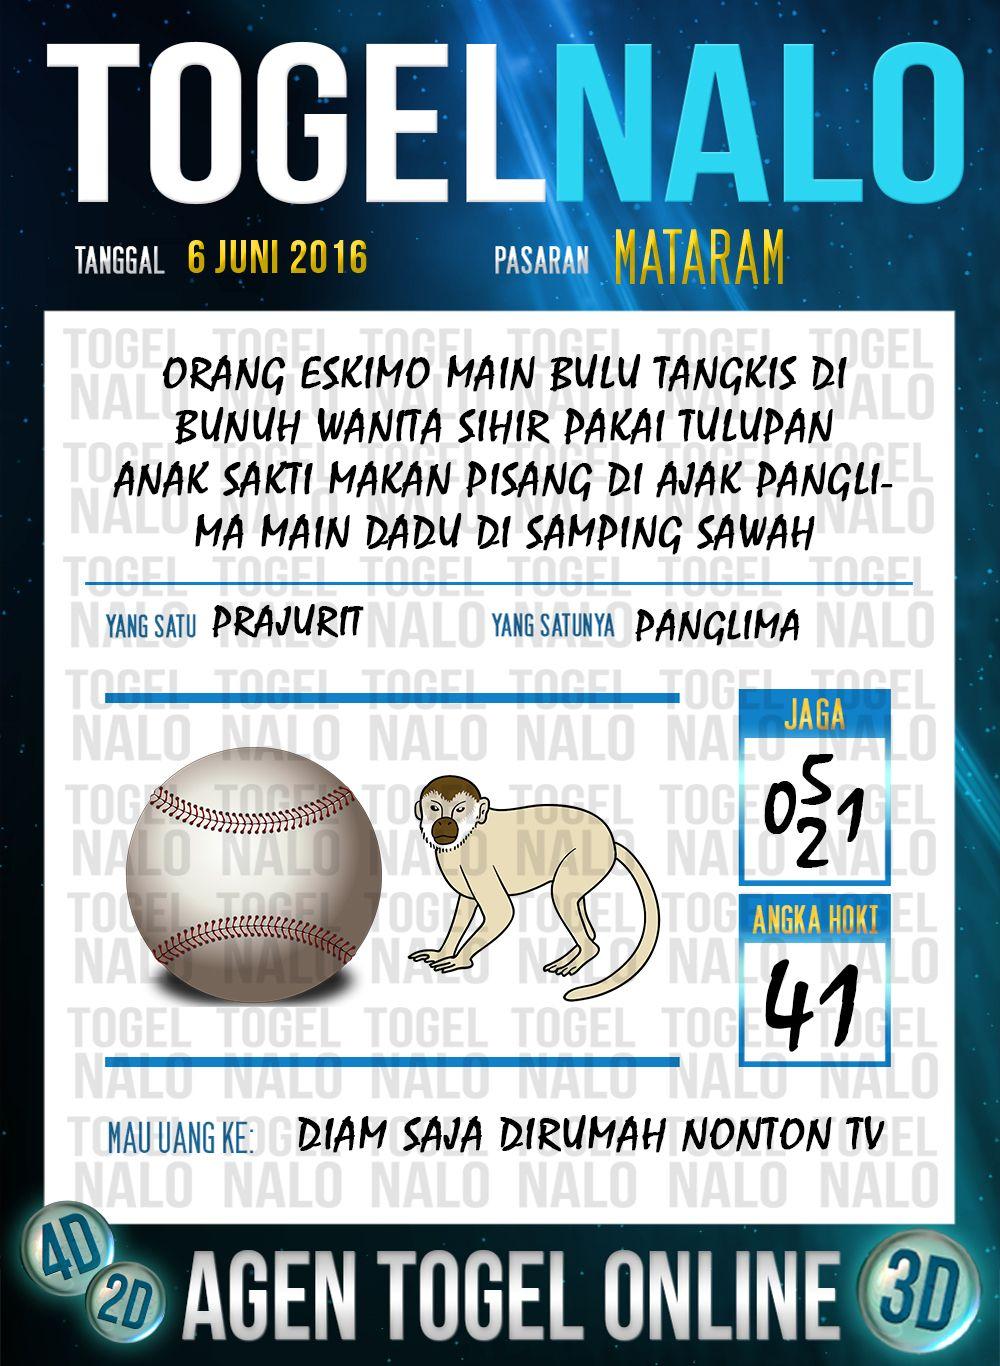 Nomor Jitu Togel Online Live Draw 4D TogelNalo Mataram 6 Juni 2016